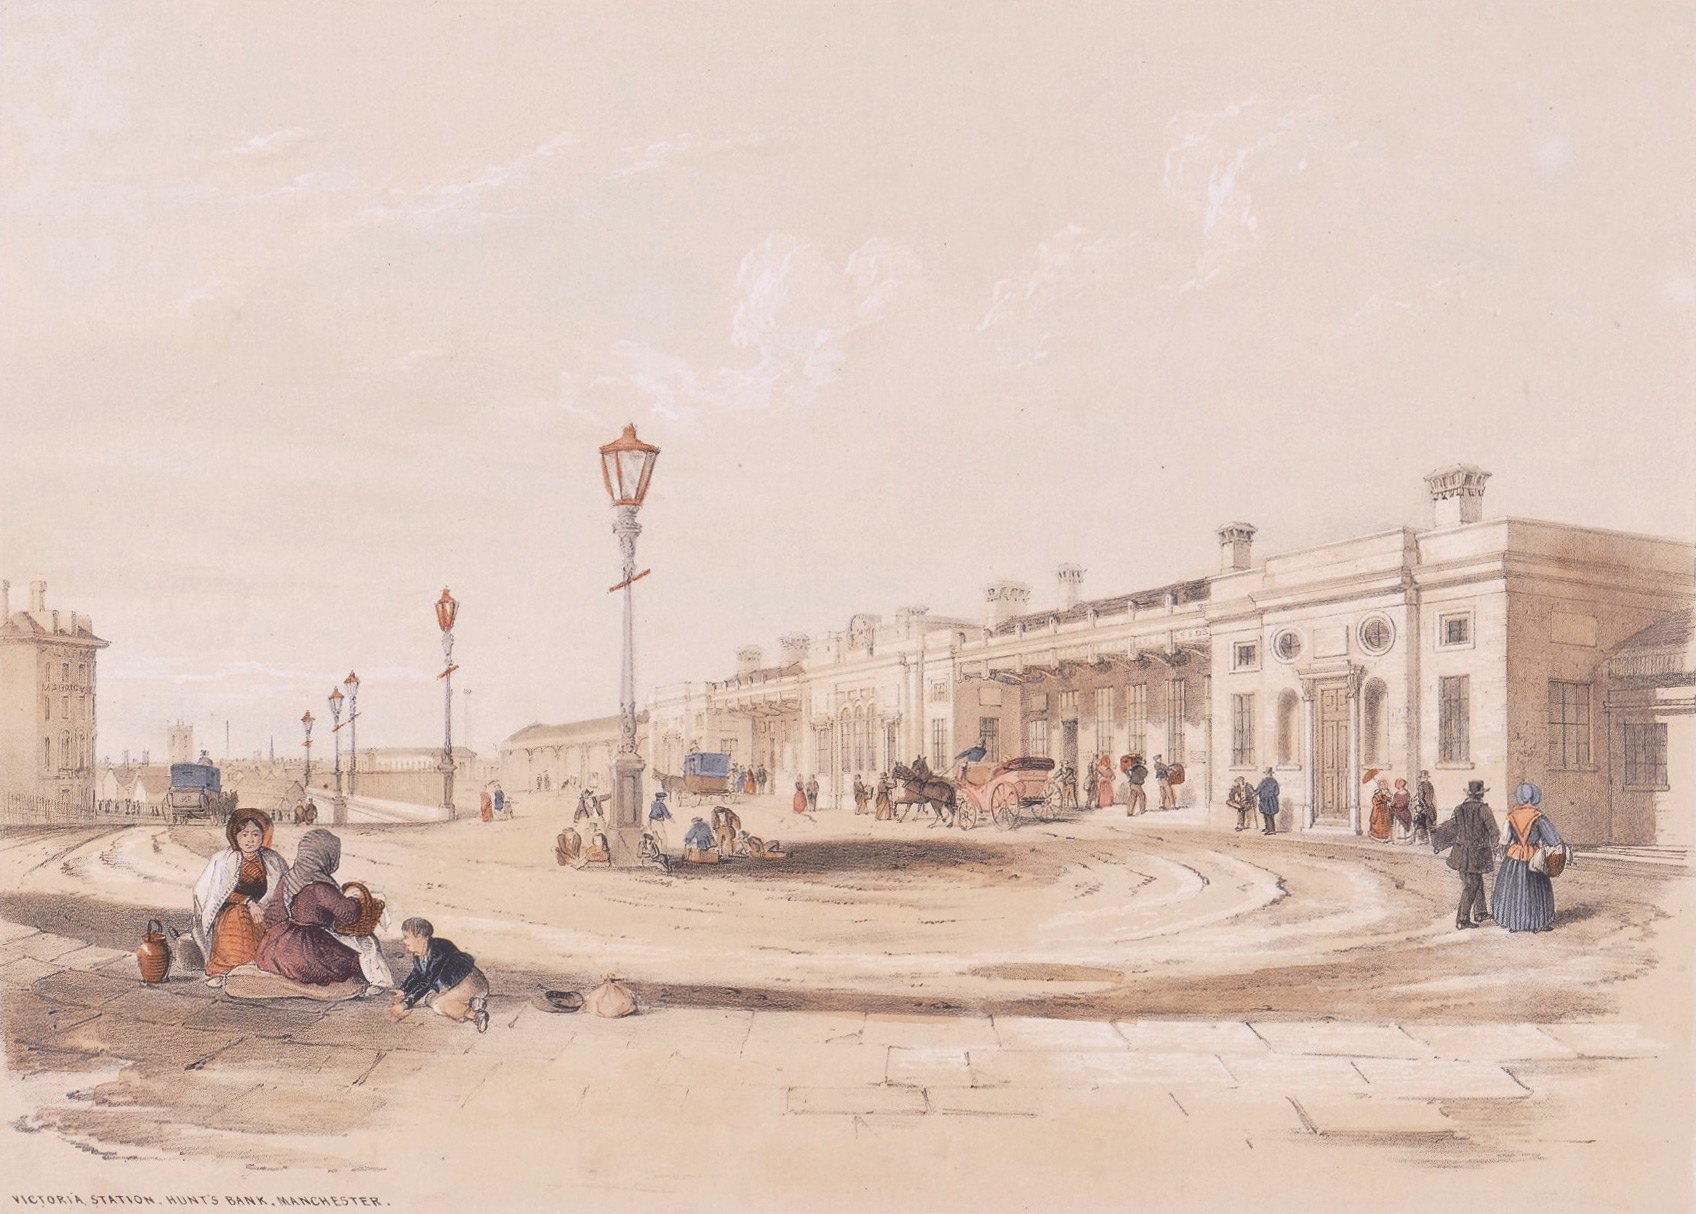 Tait (Arthur Fitzwilliam) Victoria Station, Hunt's Bank, Manchester,